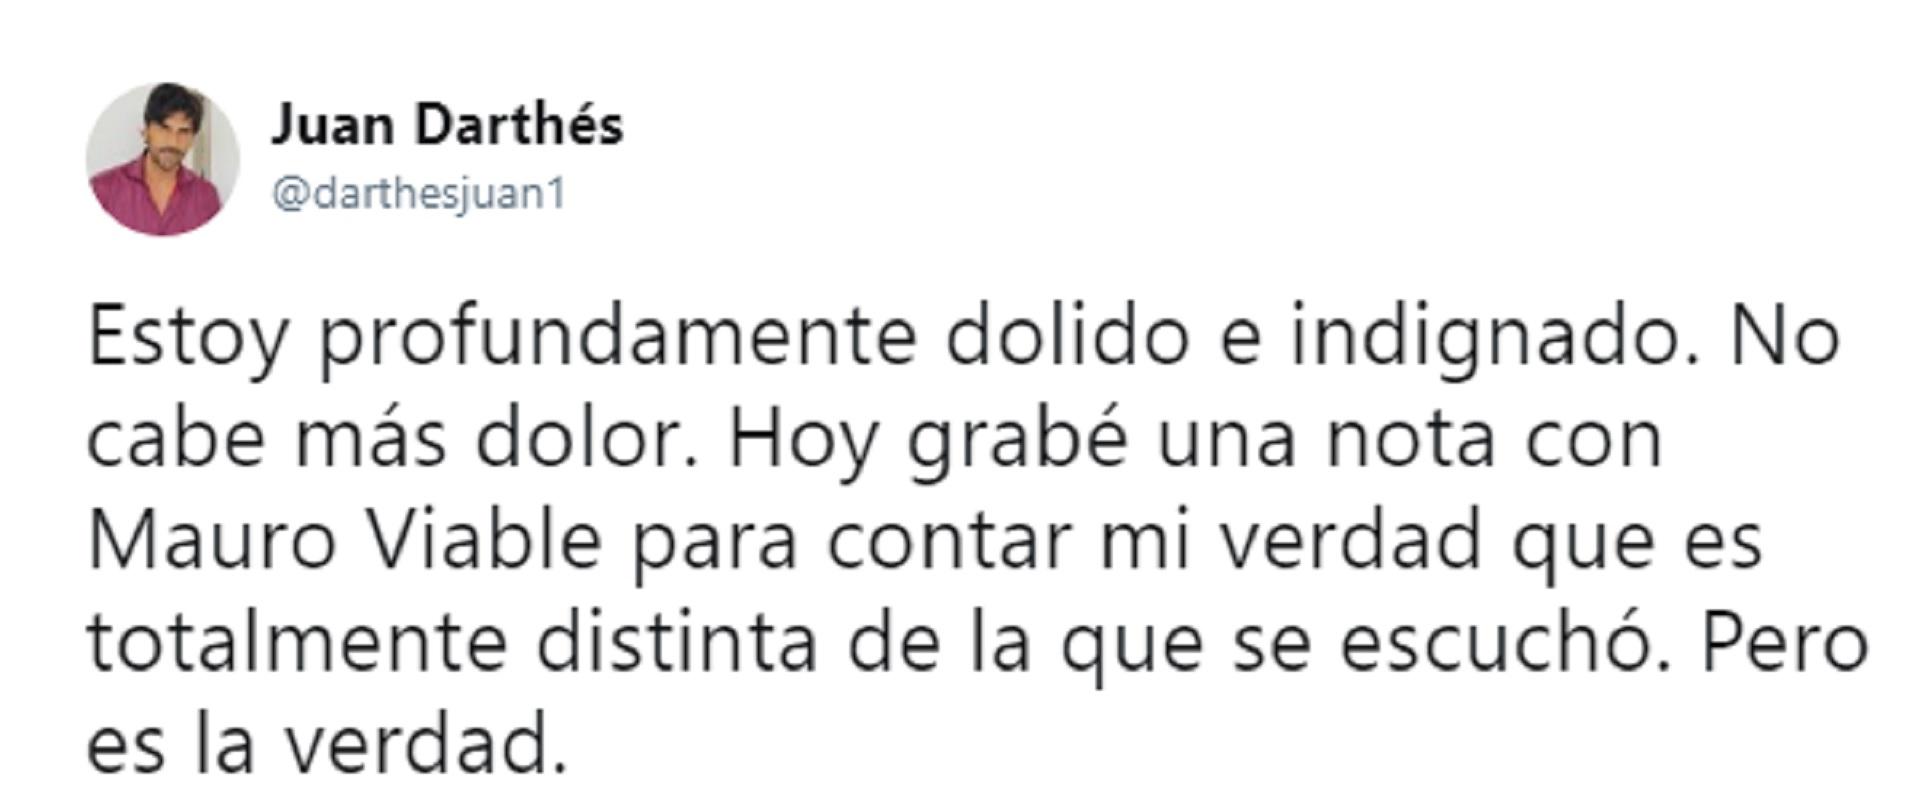 El mensaje de Juan Darthés en Twitter